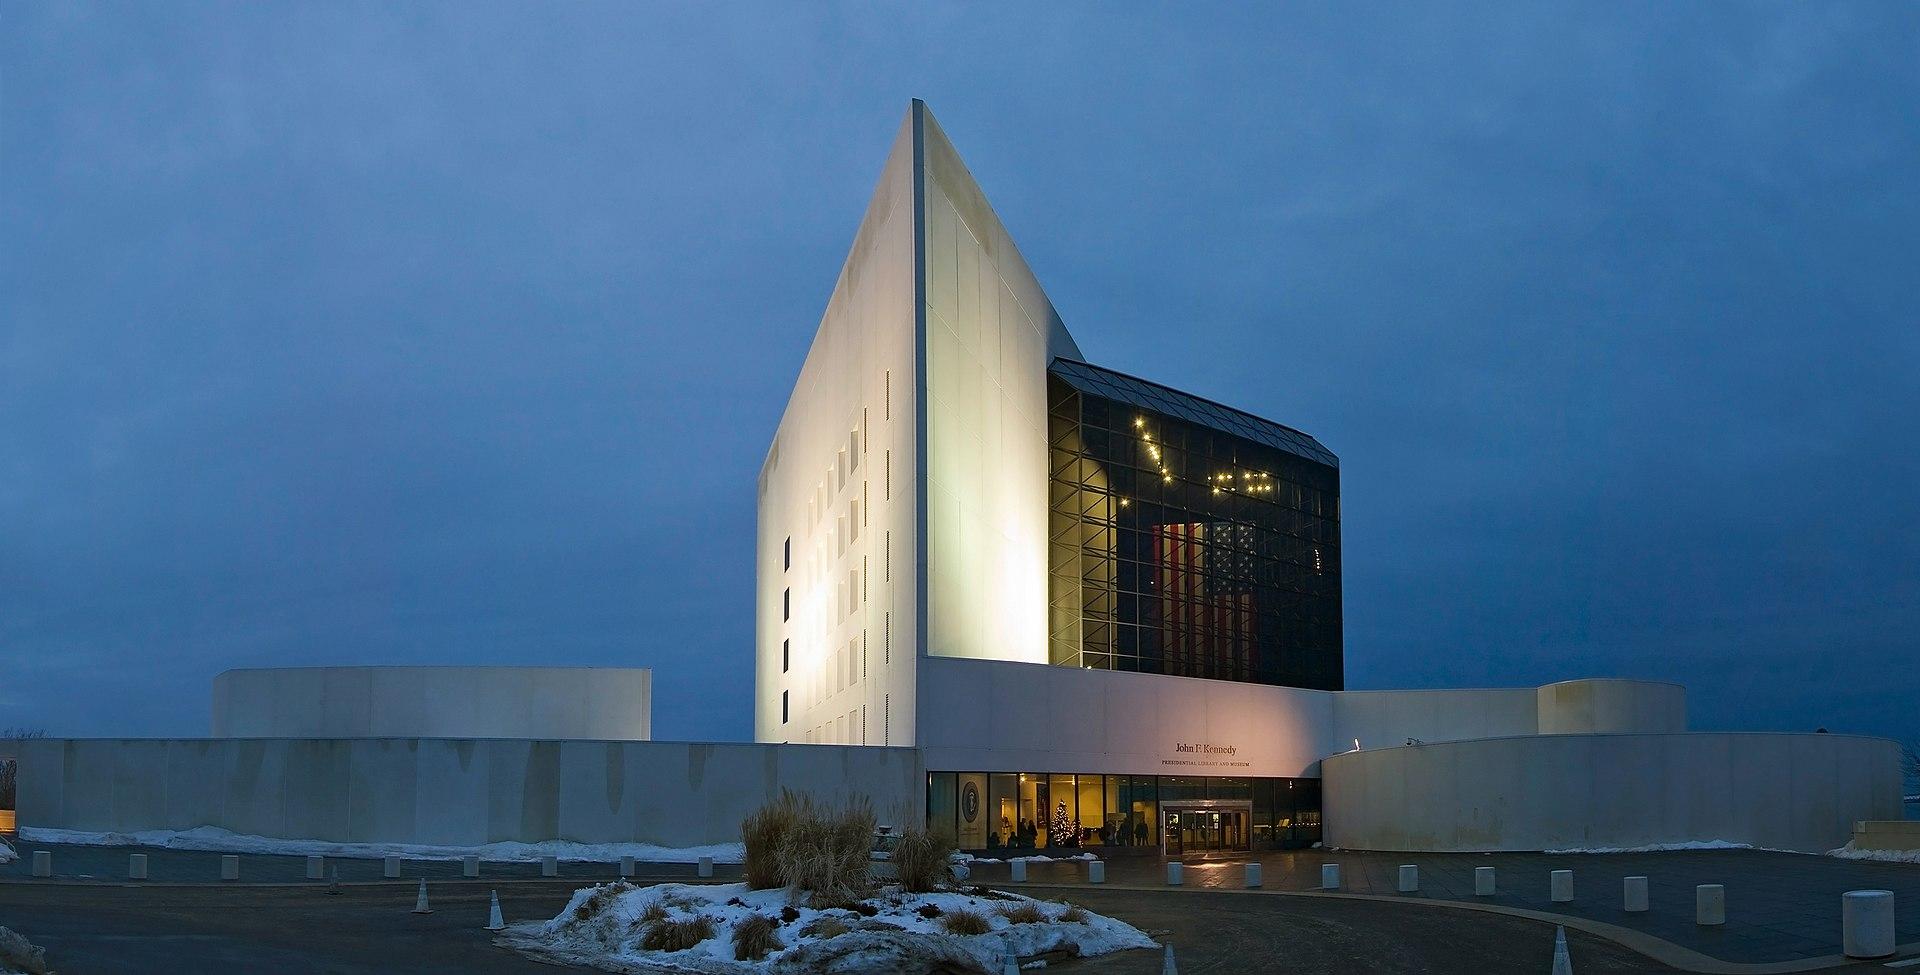 Presidential library